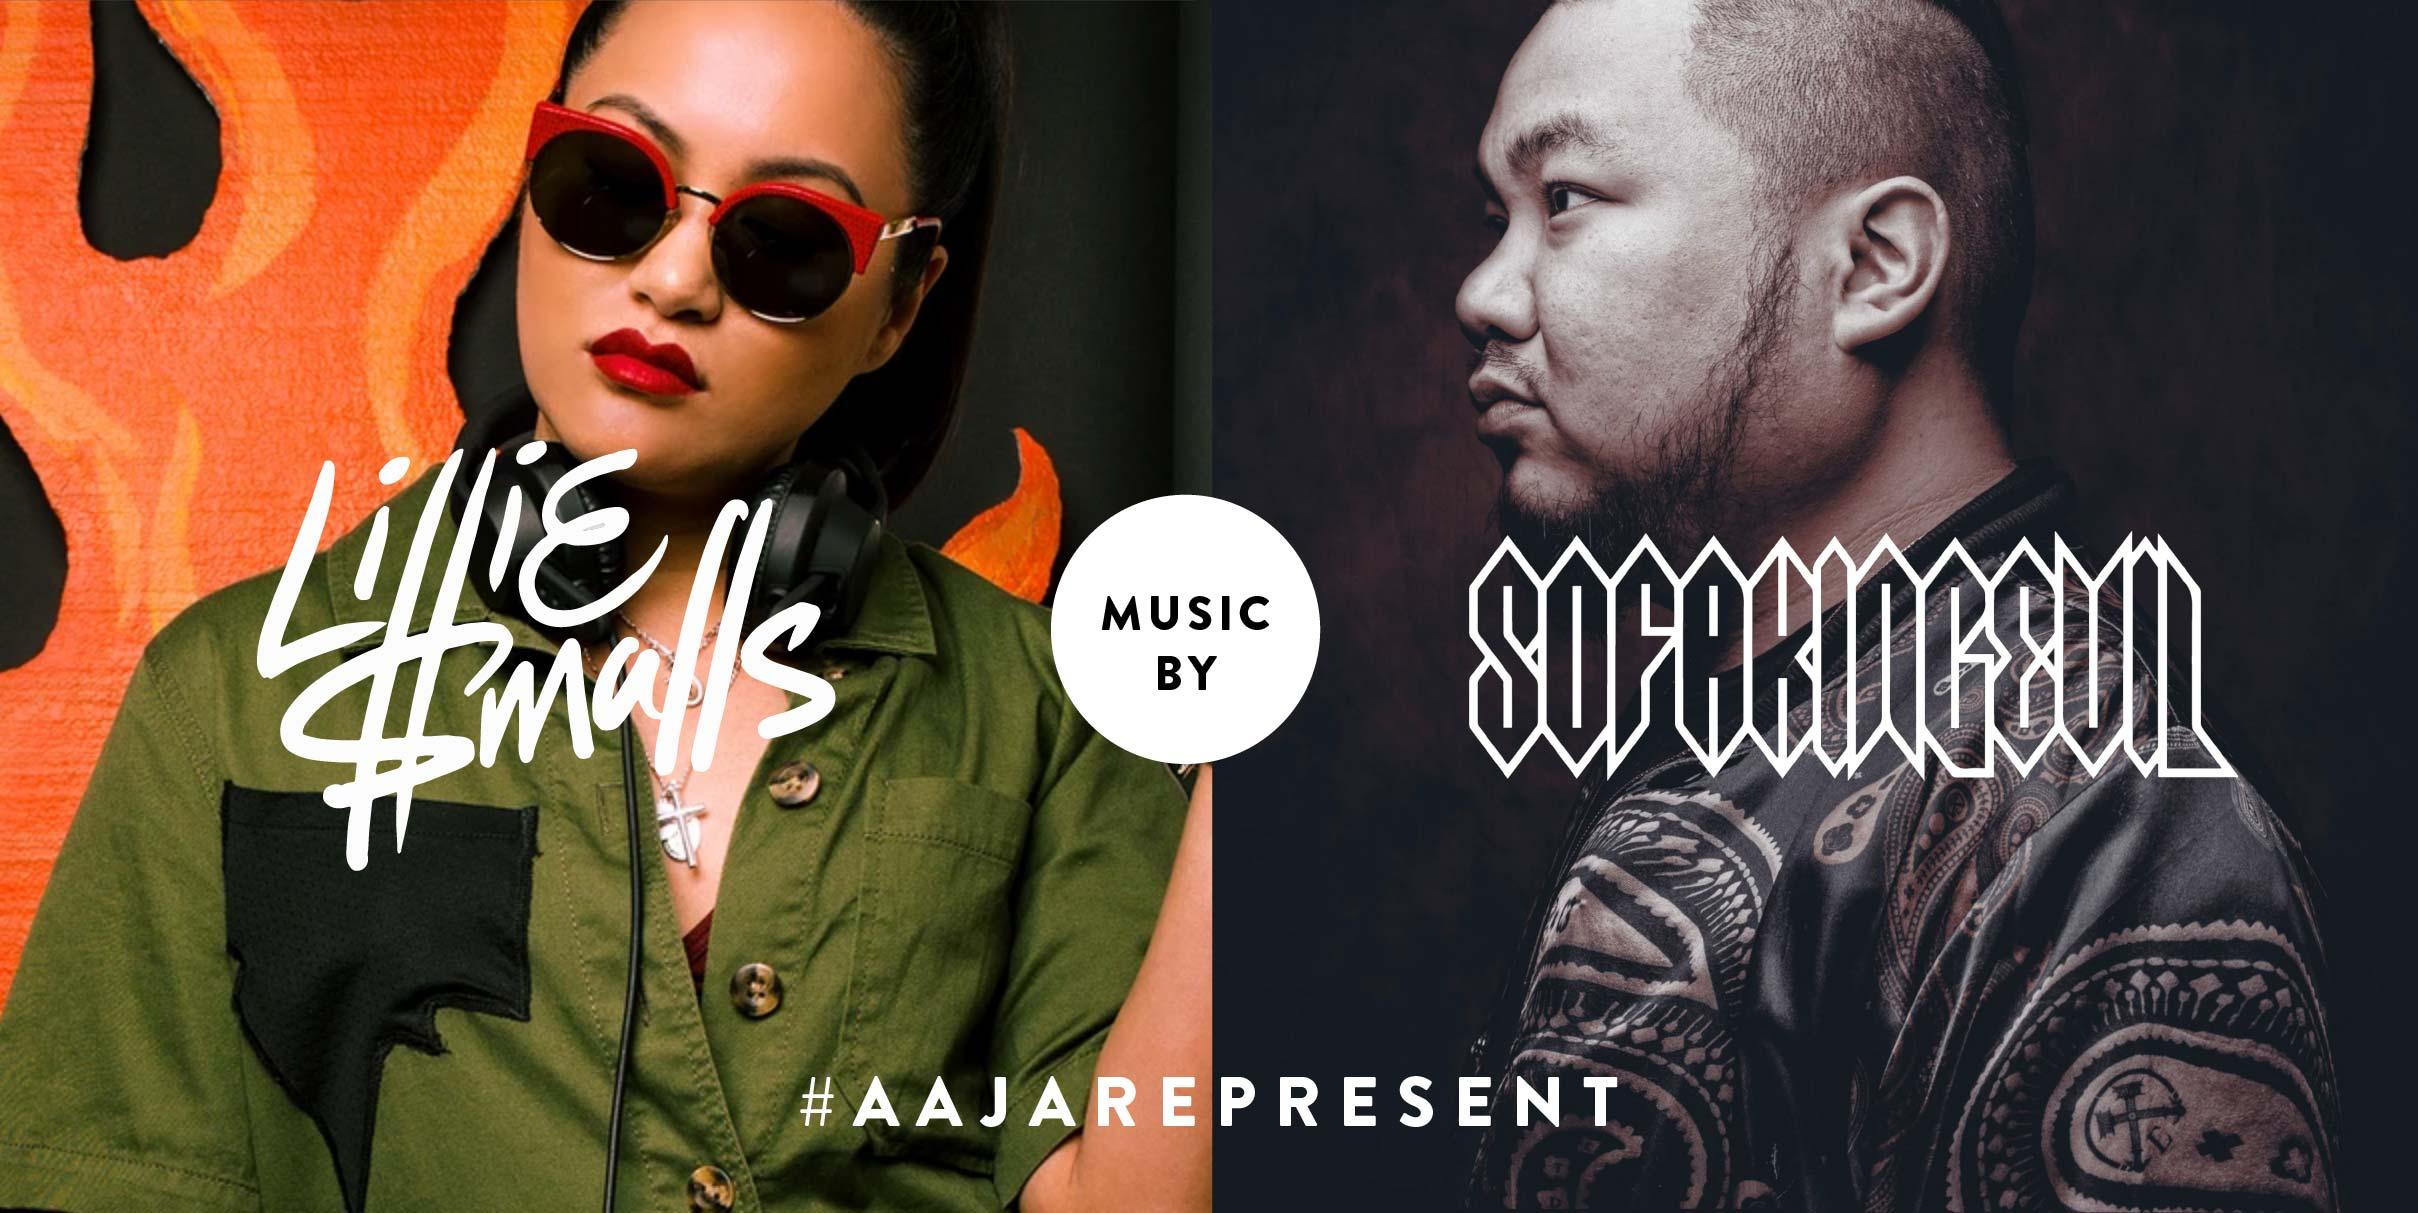 AAJARepresent Entertainment: DJ LillieSmalls and DJ Sofa King Evil